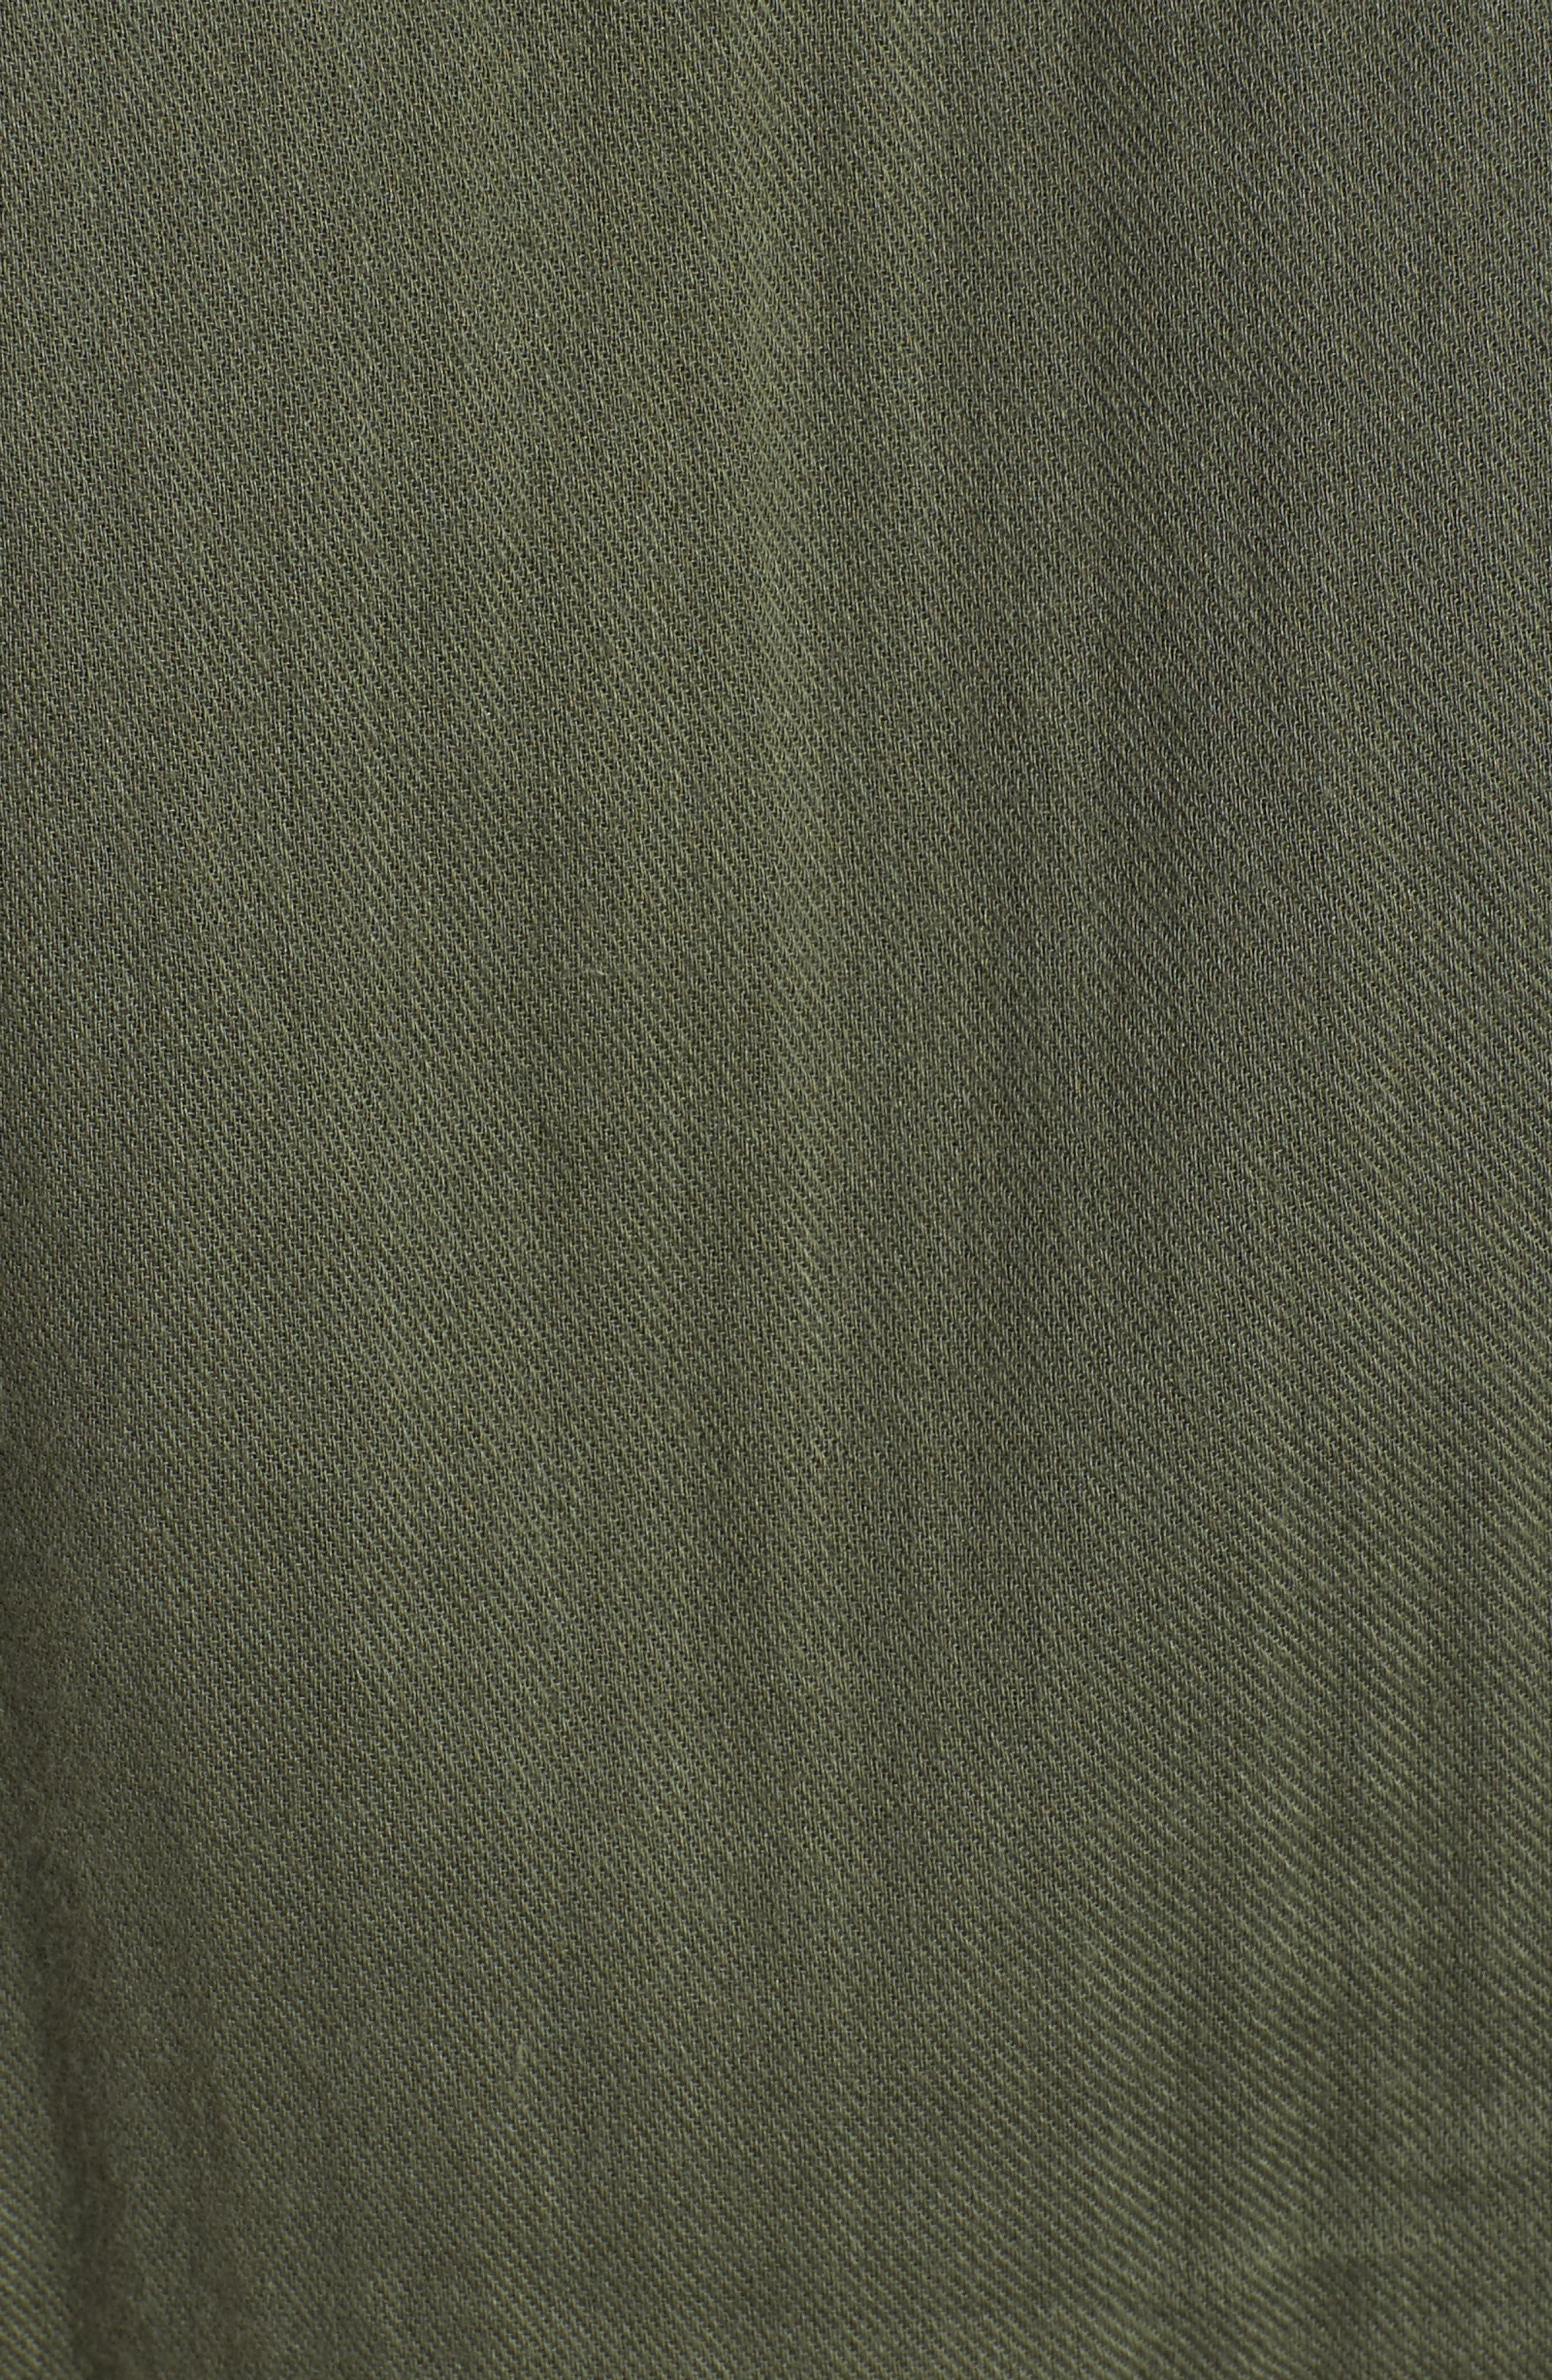 Kingston Cotton Romper,                             Alternate thumbnail 5, color,                             OLIVE LIGHT OLIVE